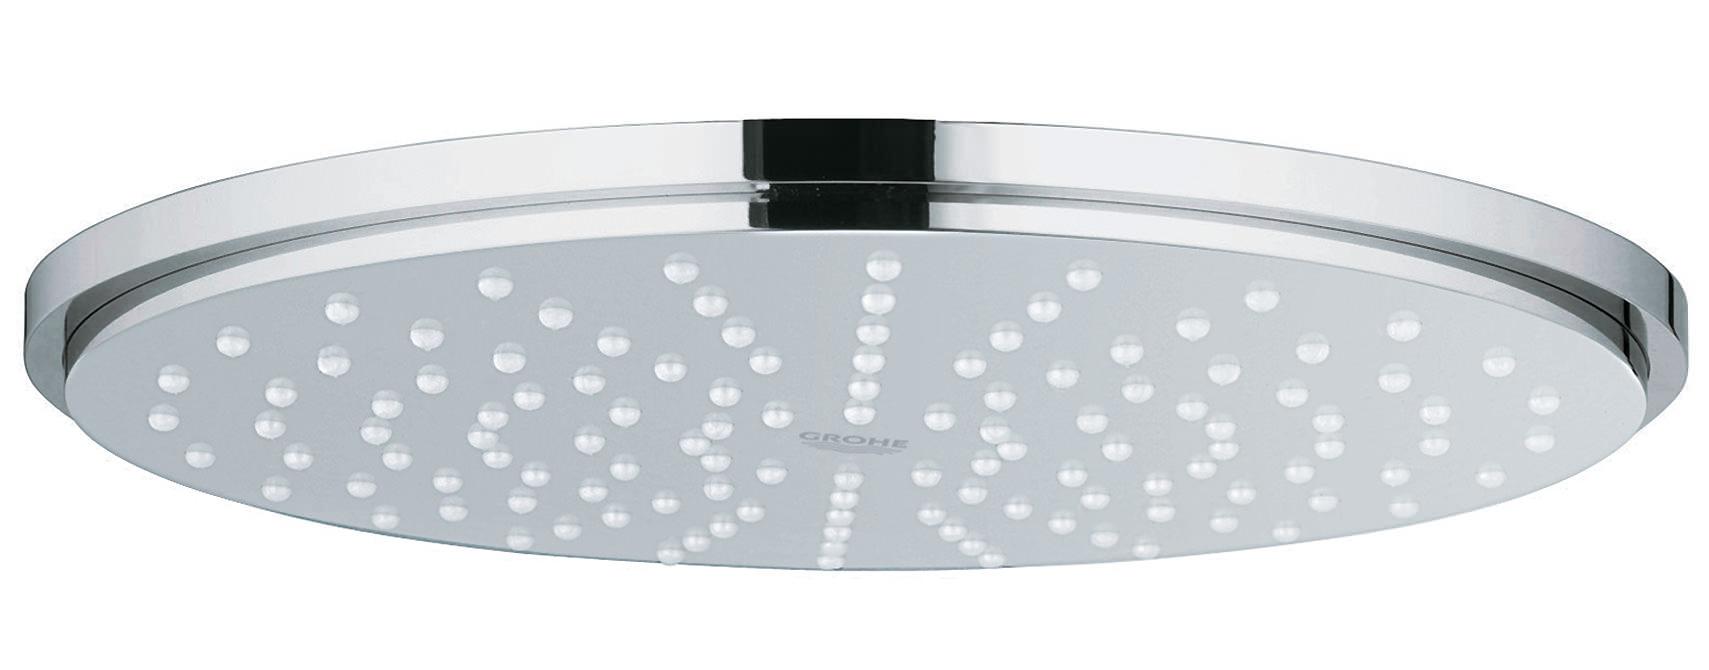 grohe rainshower 210mm single spray shower head